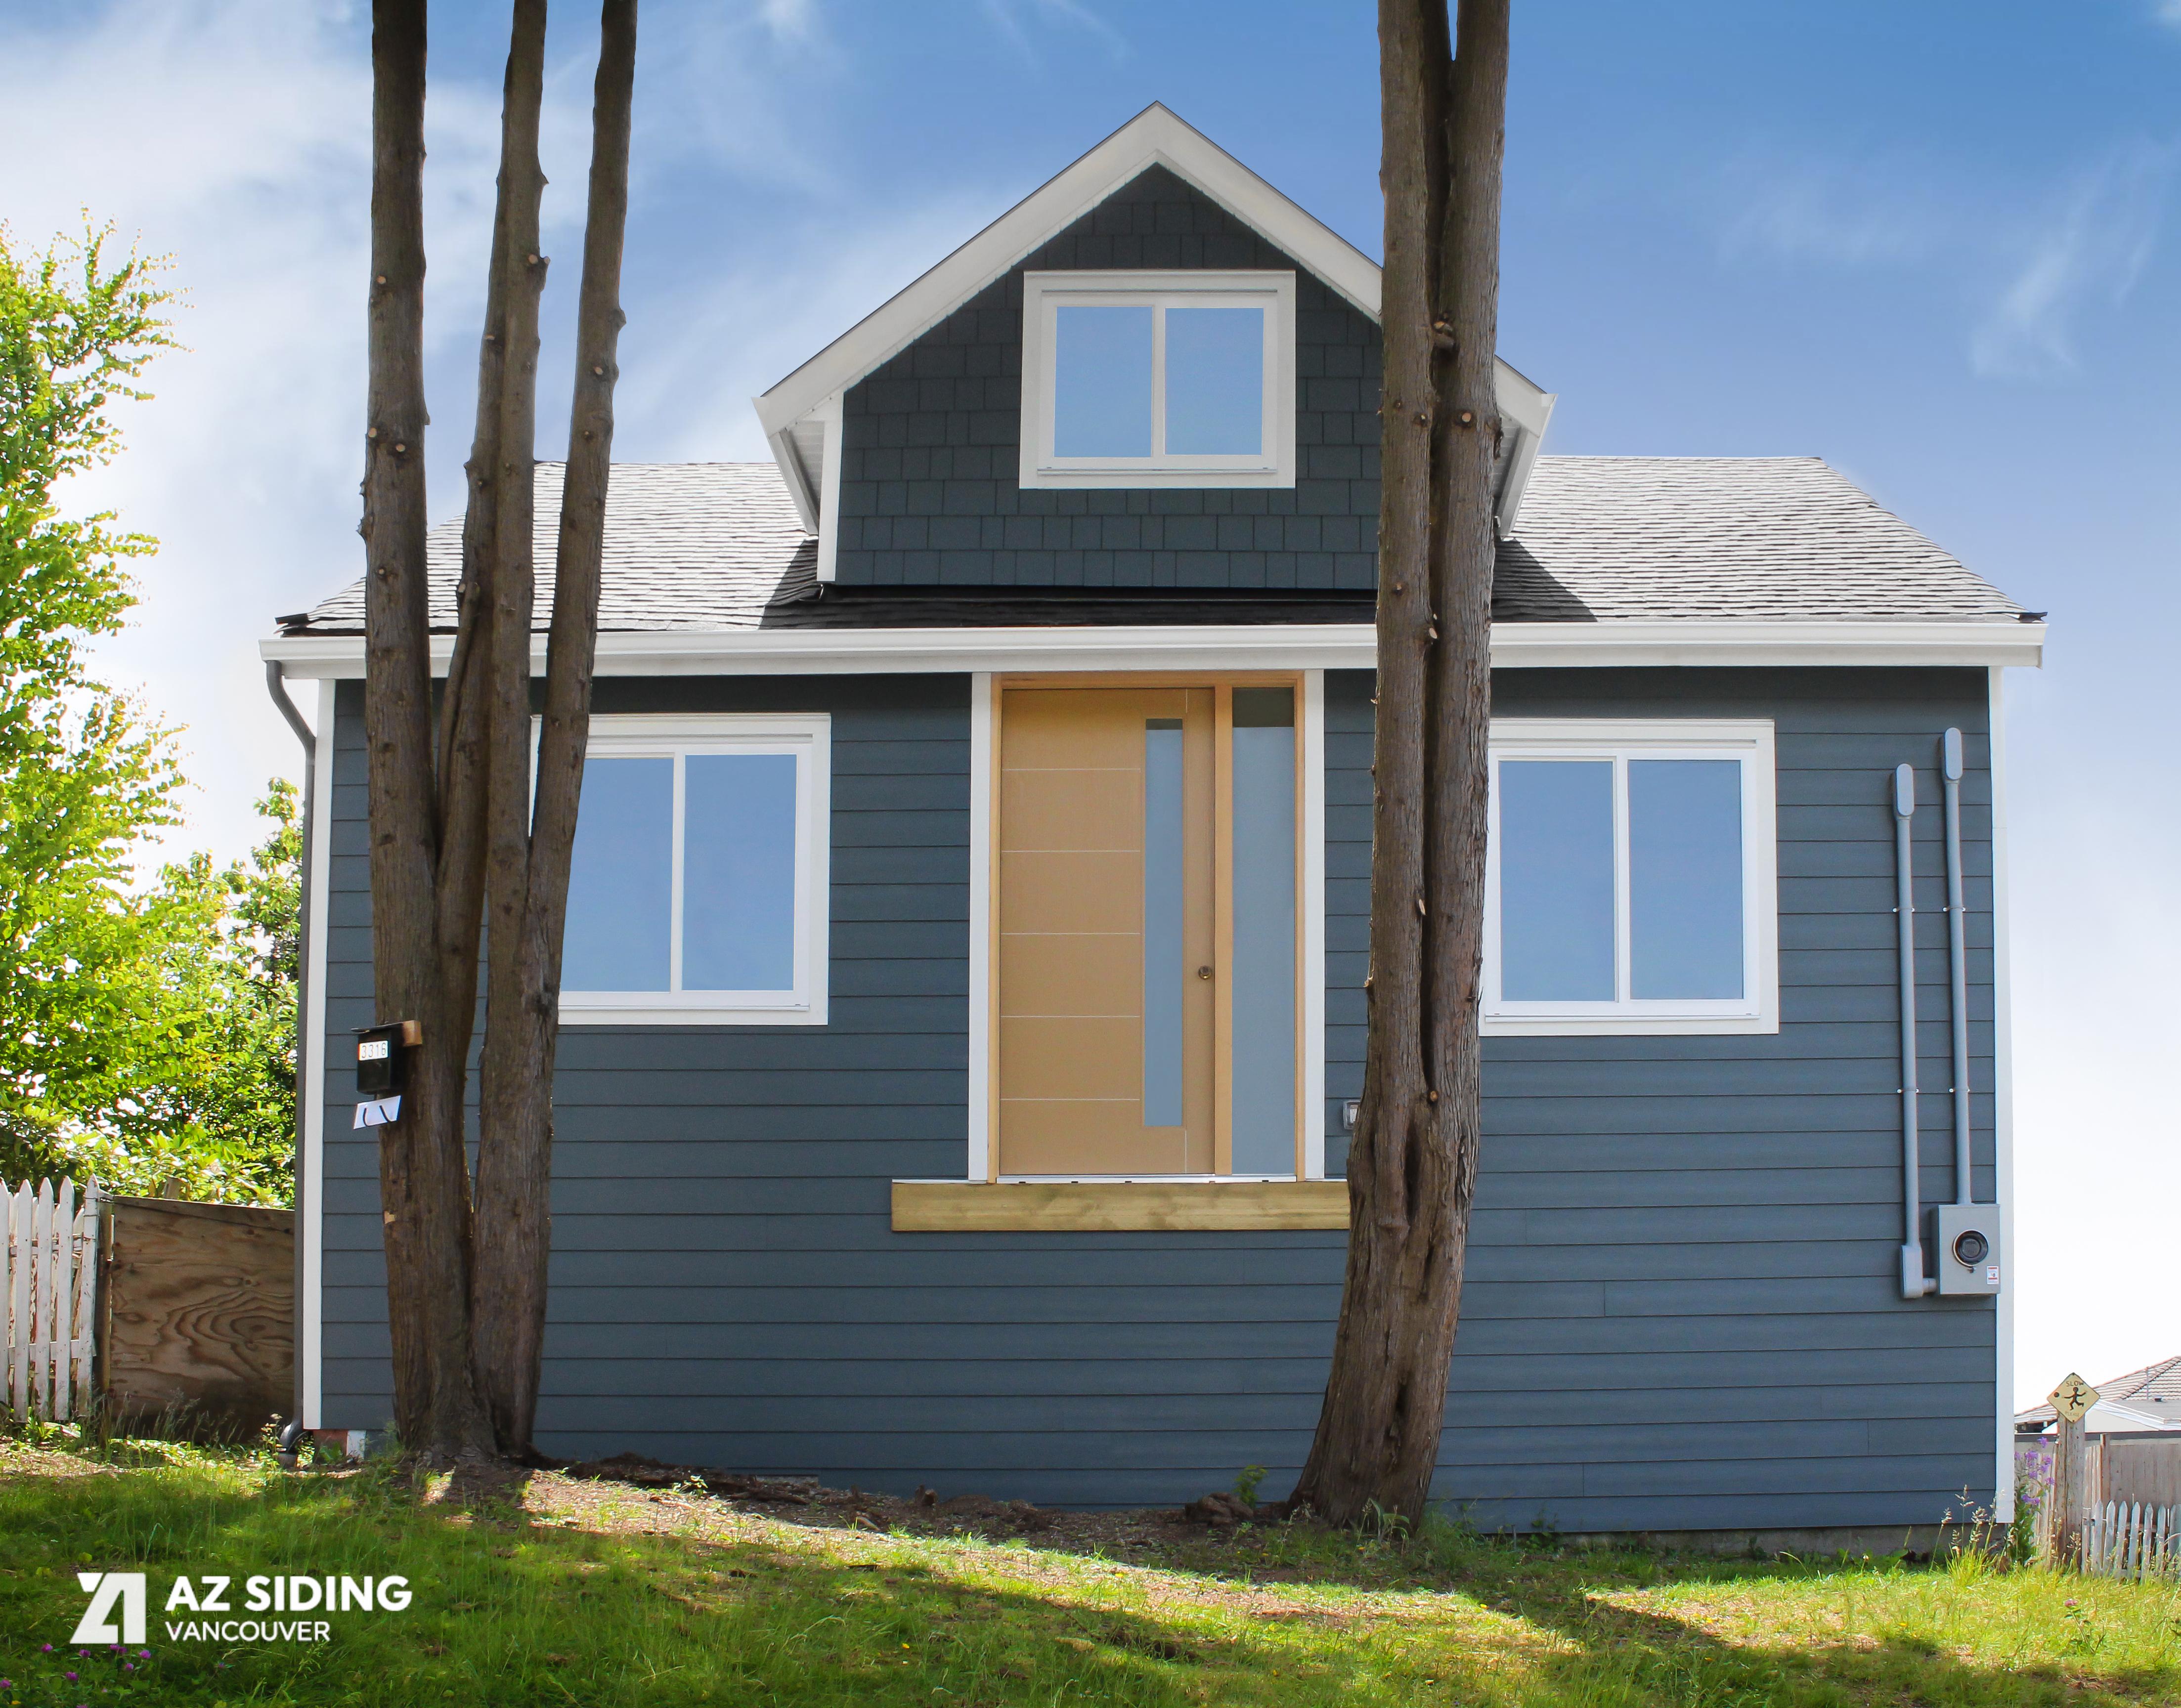 Material Az Siding Inc Vancouver Siding Company